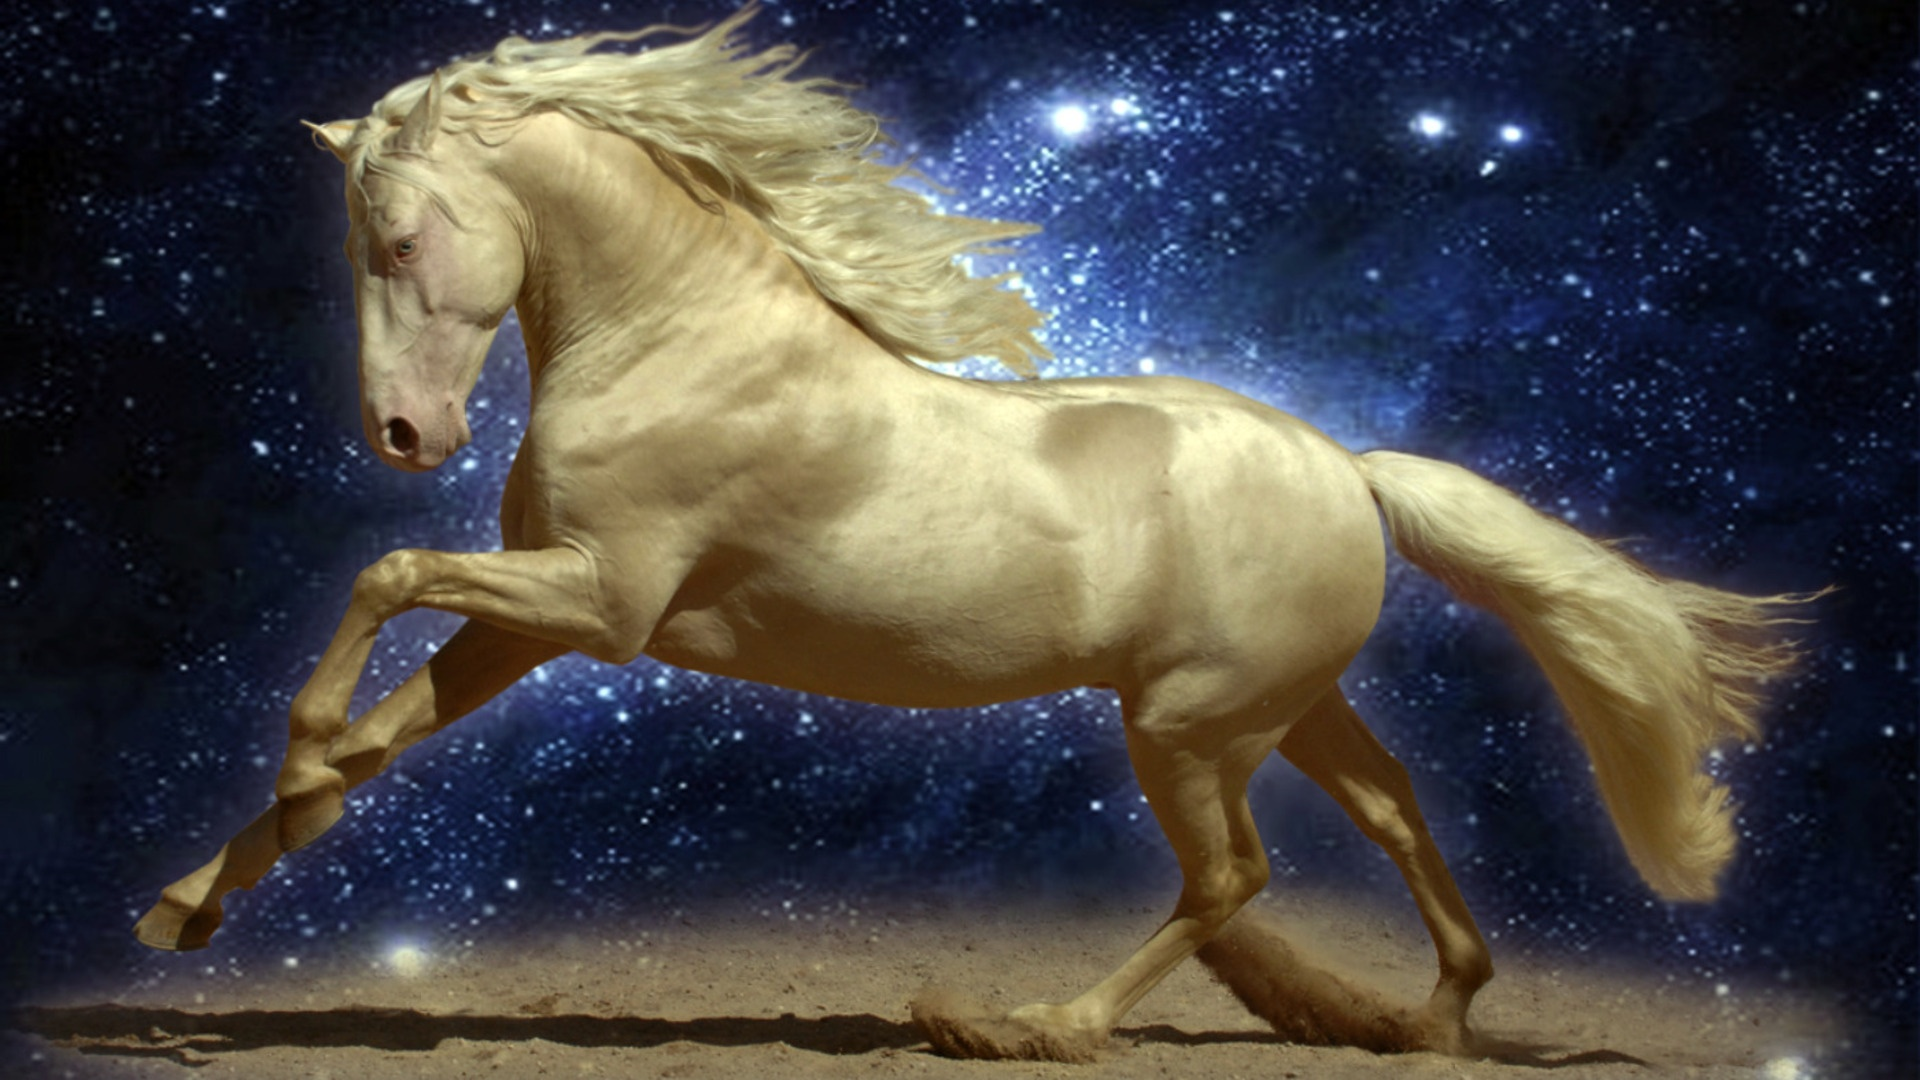 horses wallpaper 3d wallpaper horses wallpaper 3d hd wallpaper